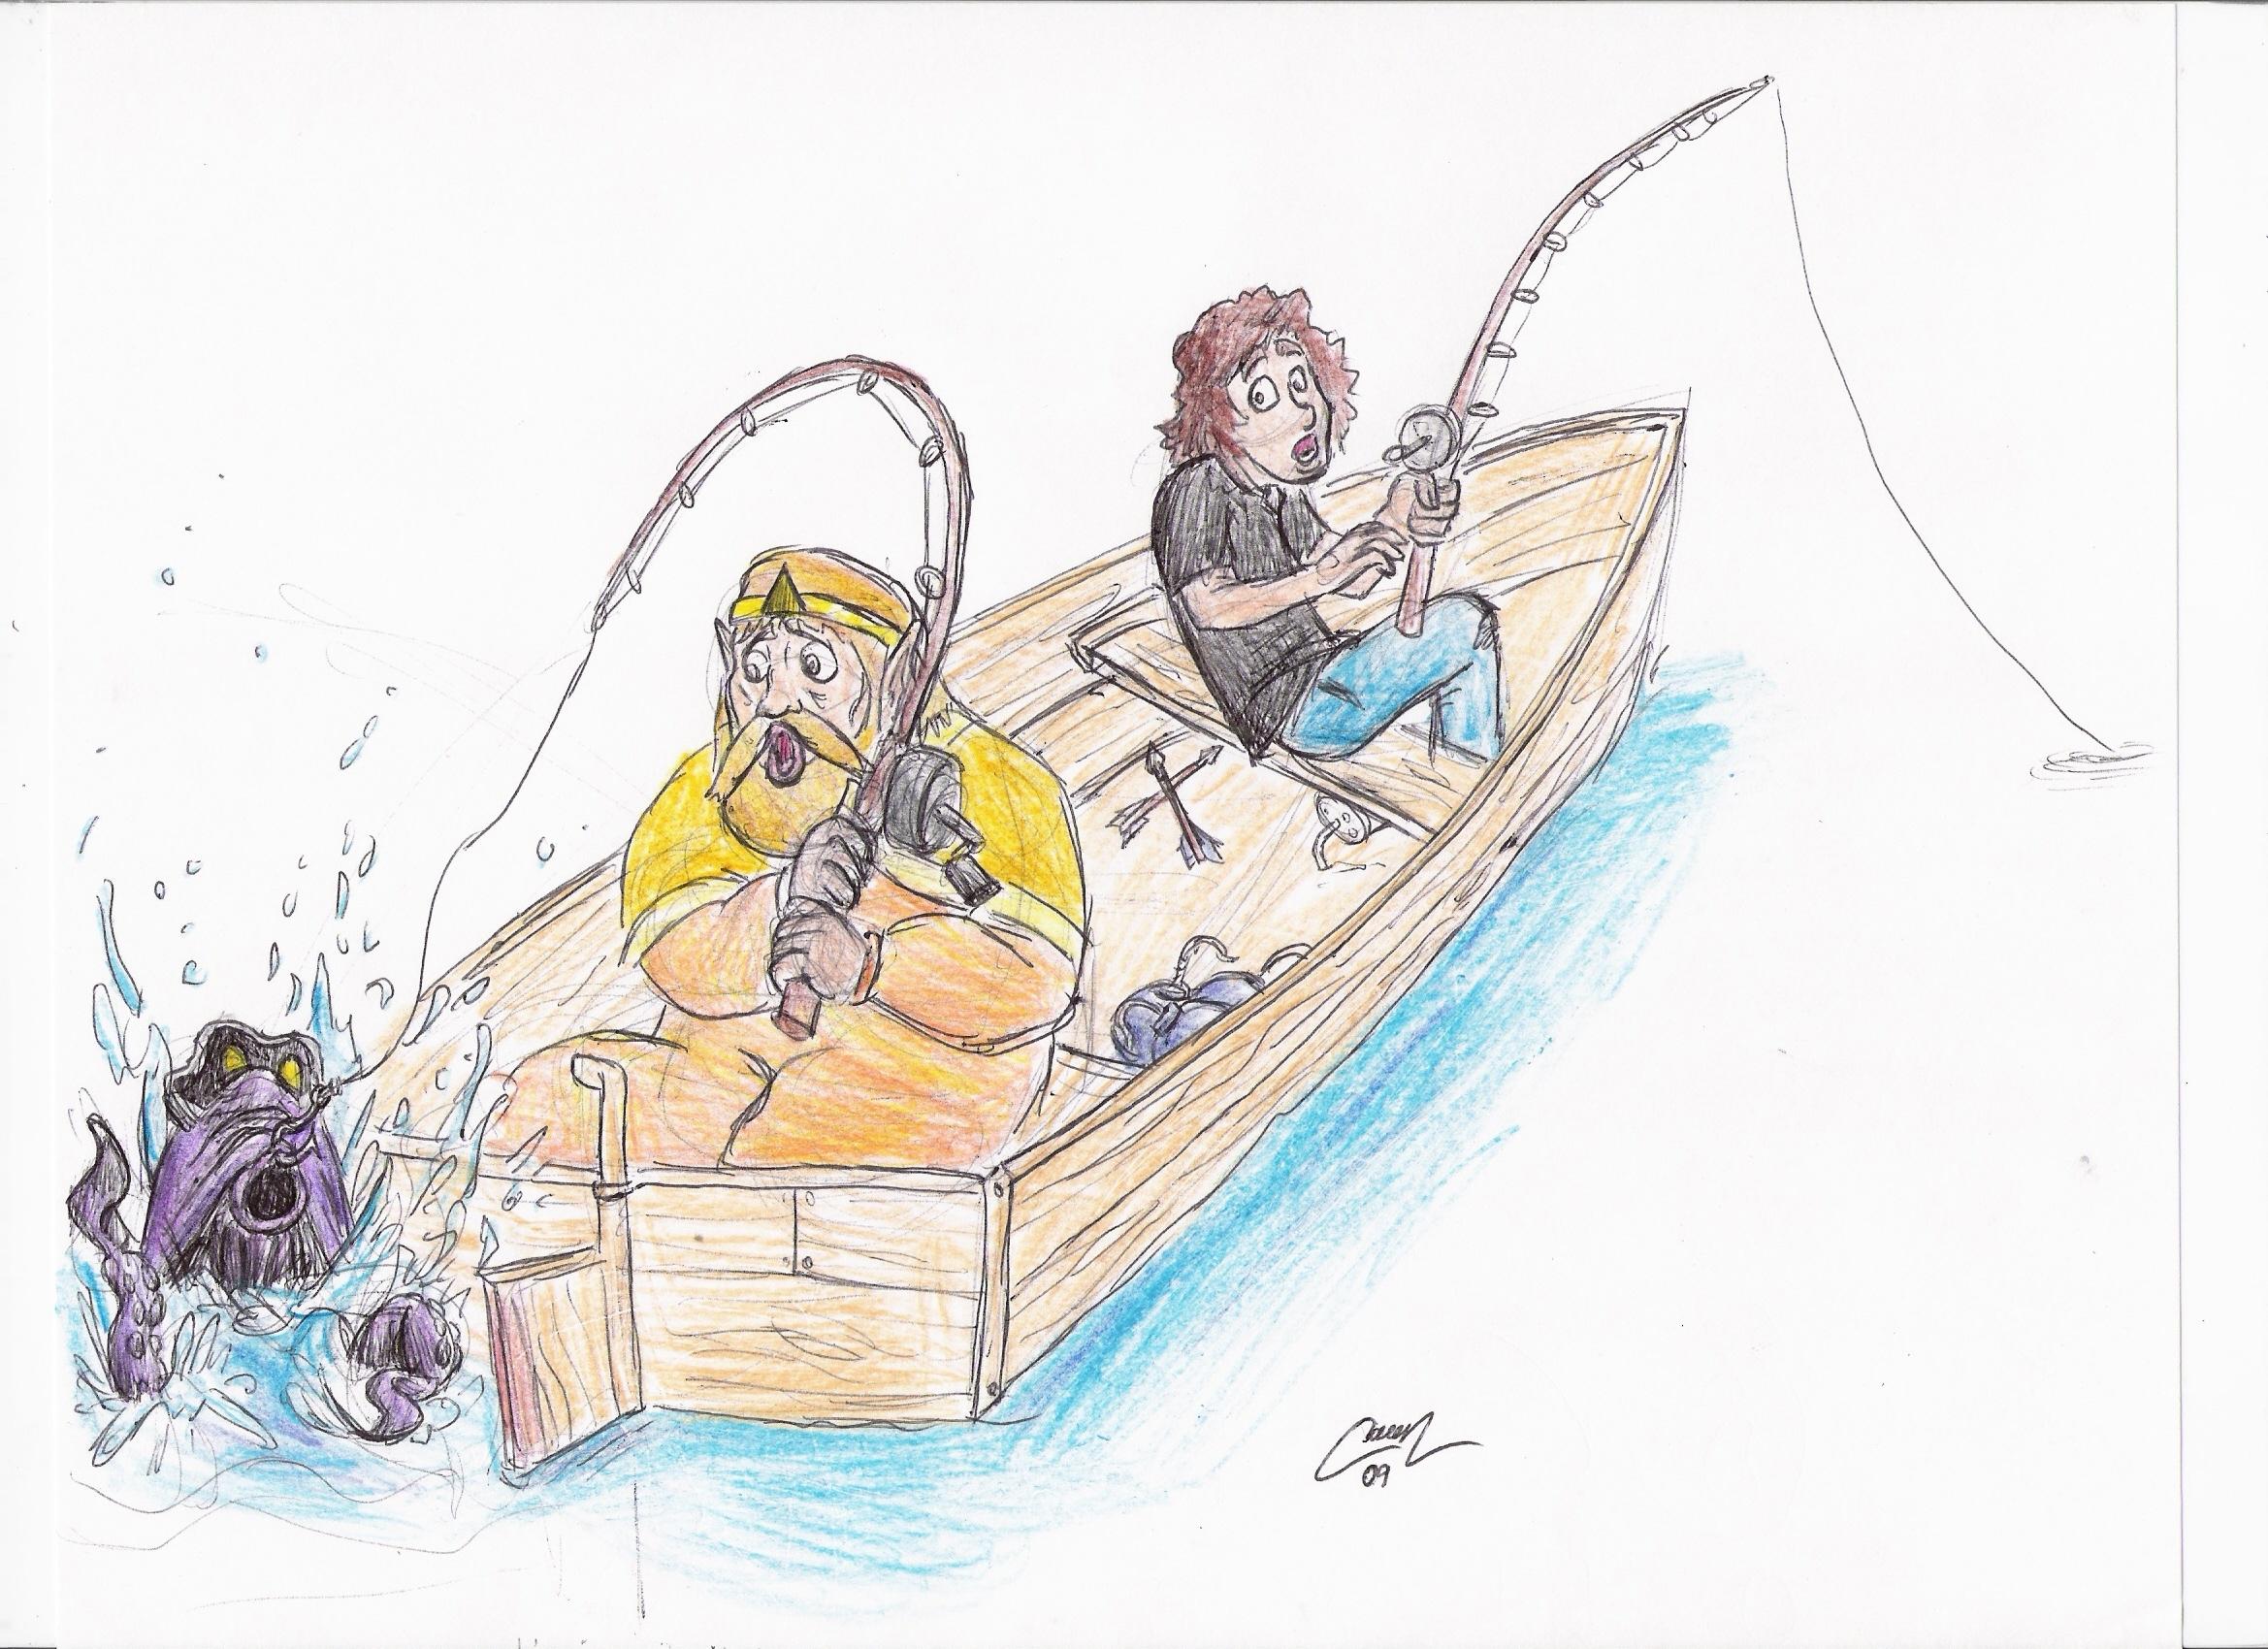 Octorok Fishing